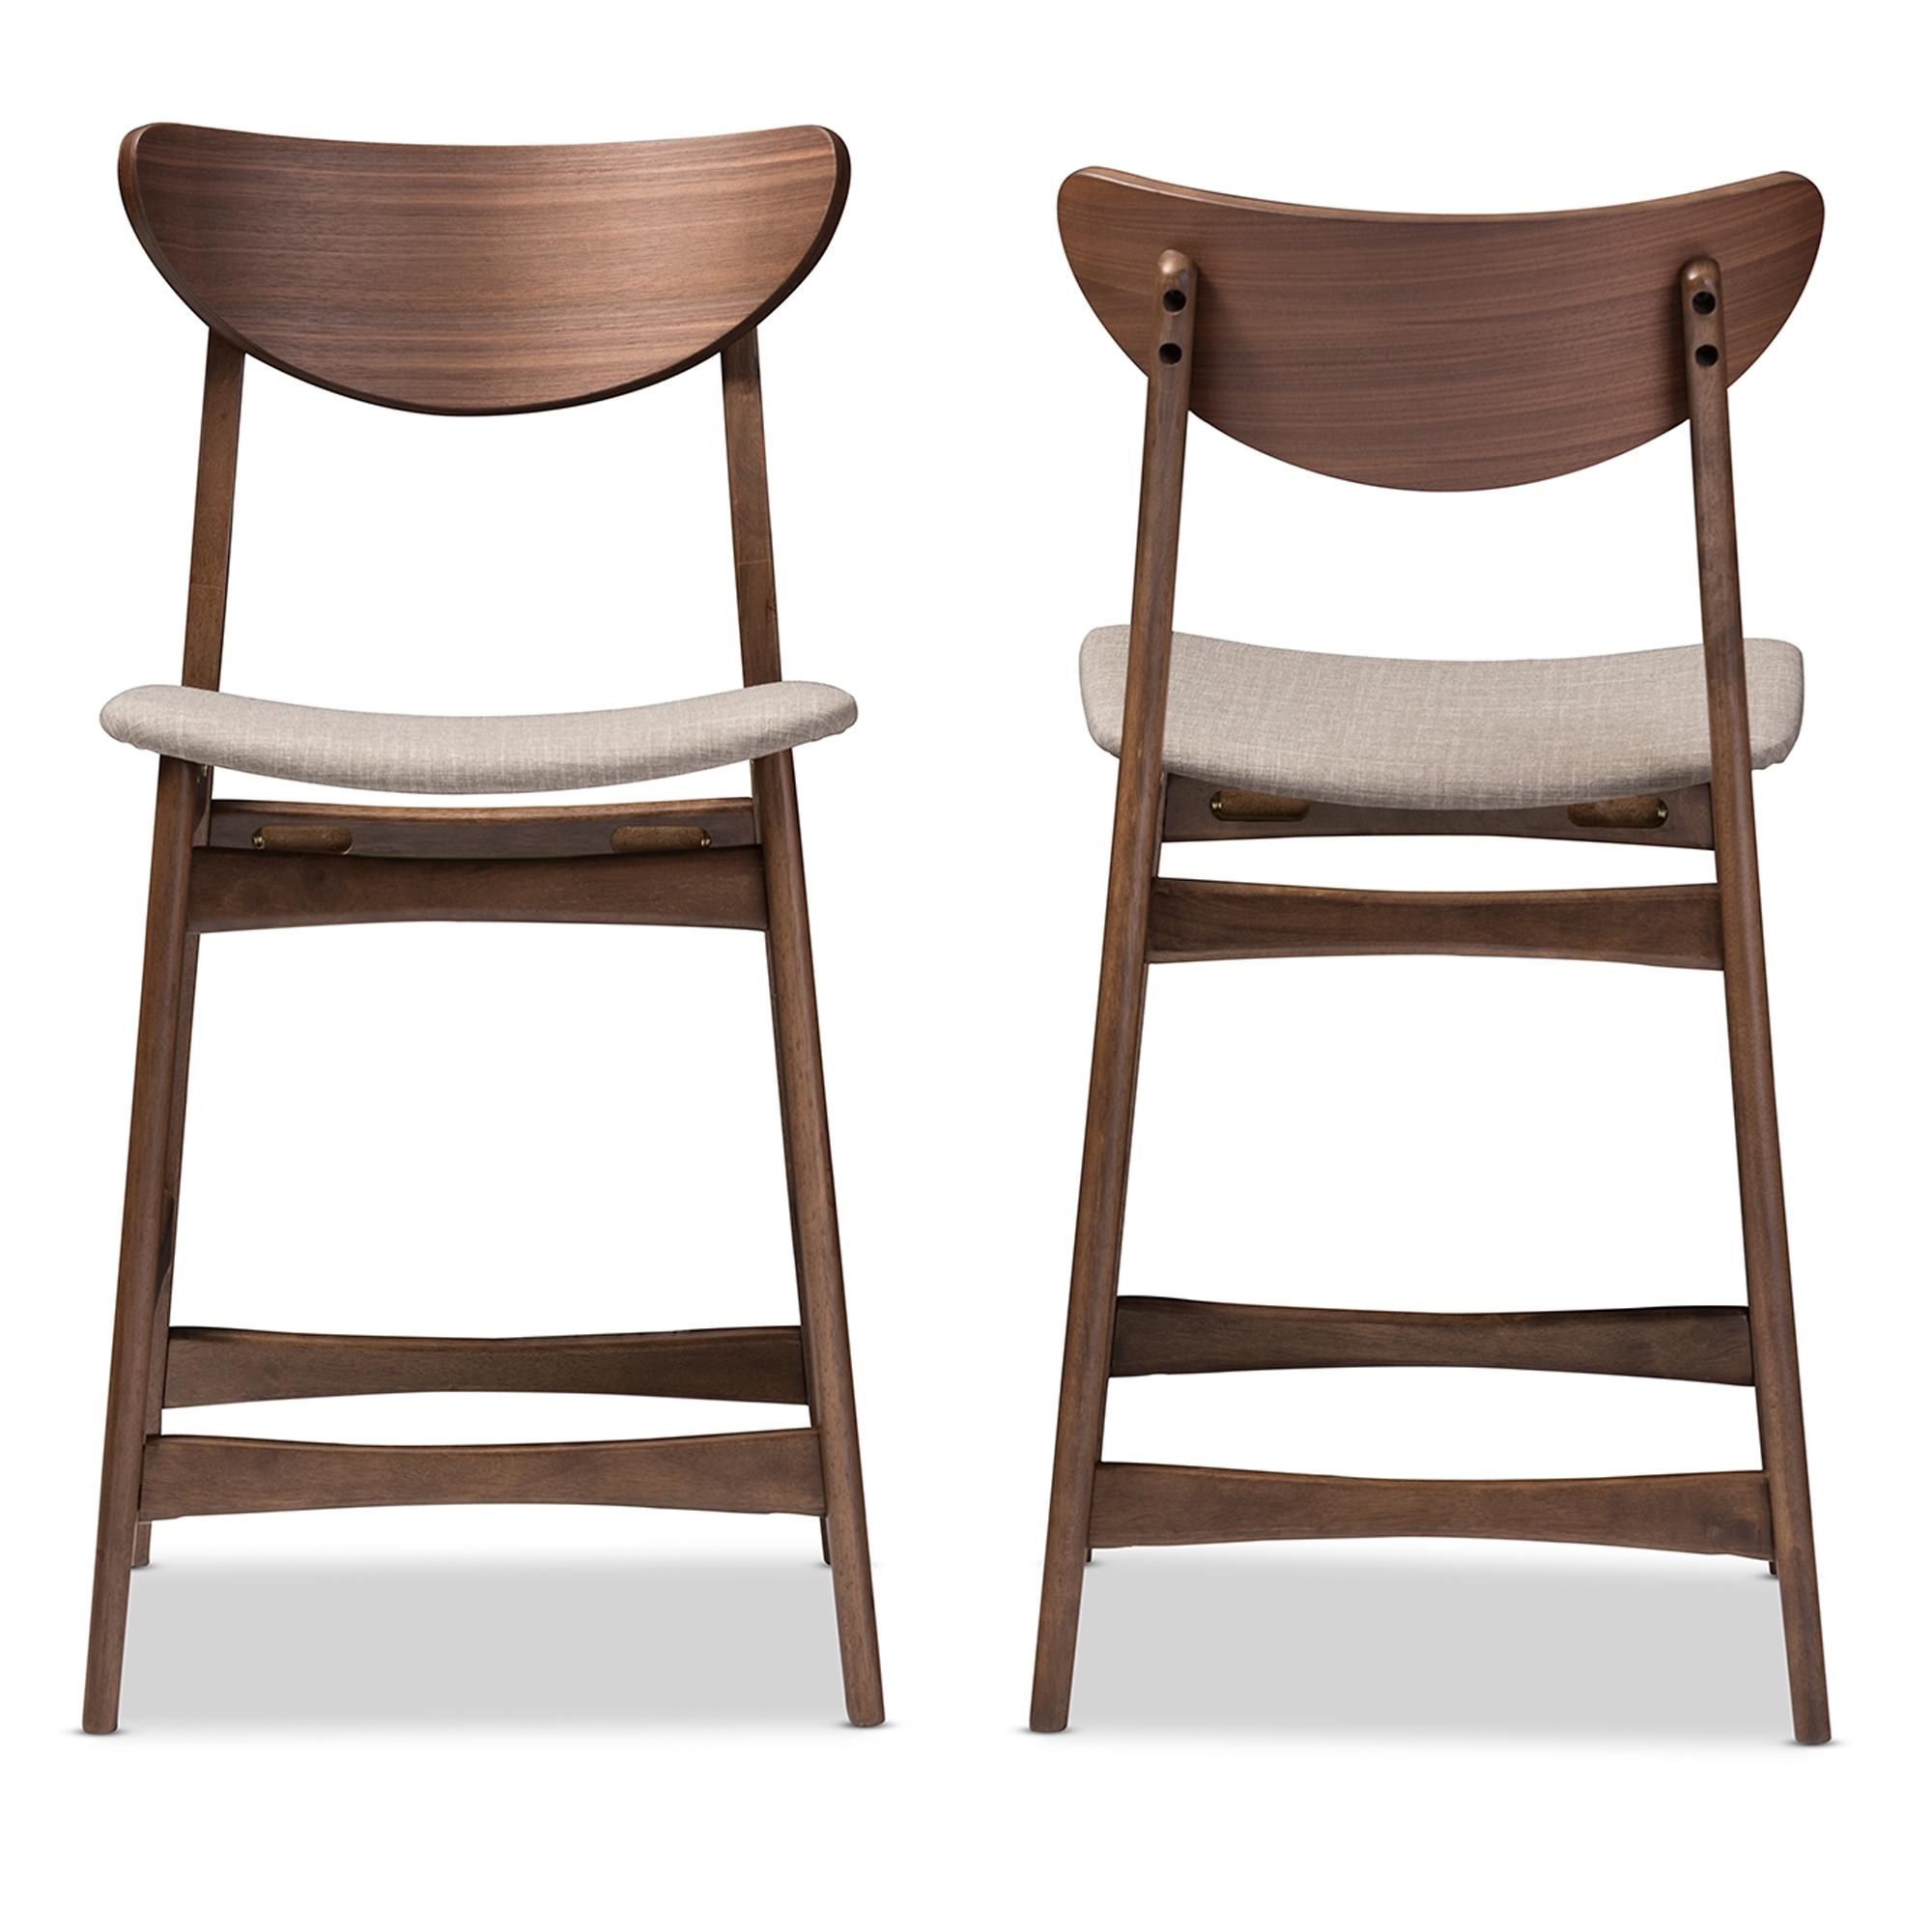 baxton studio latina midcentury retro modern style light grey fabric upholstered walnut wood - Modern Counter Stools